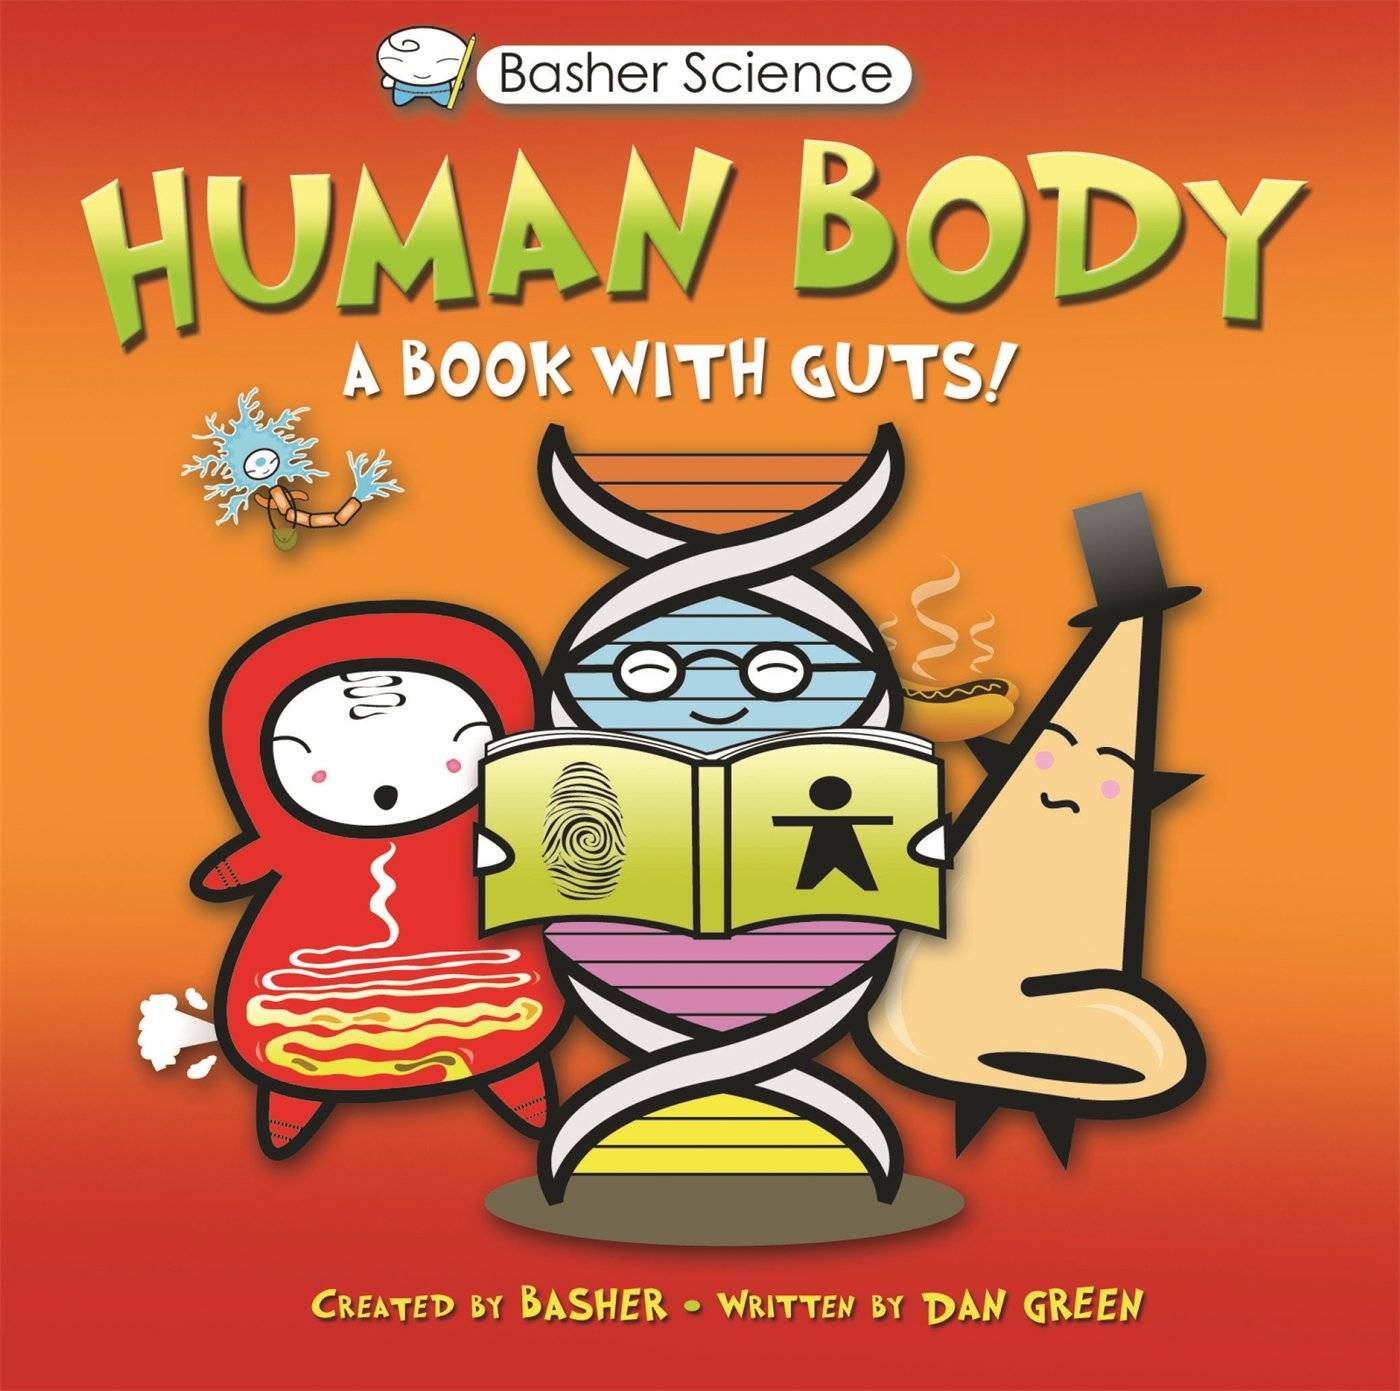 Basher Science: Human Body: A Book with Guts!: Dan Green, Simon Basher:  9780753465011: Amazon.com: Books